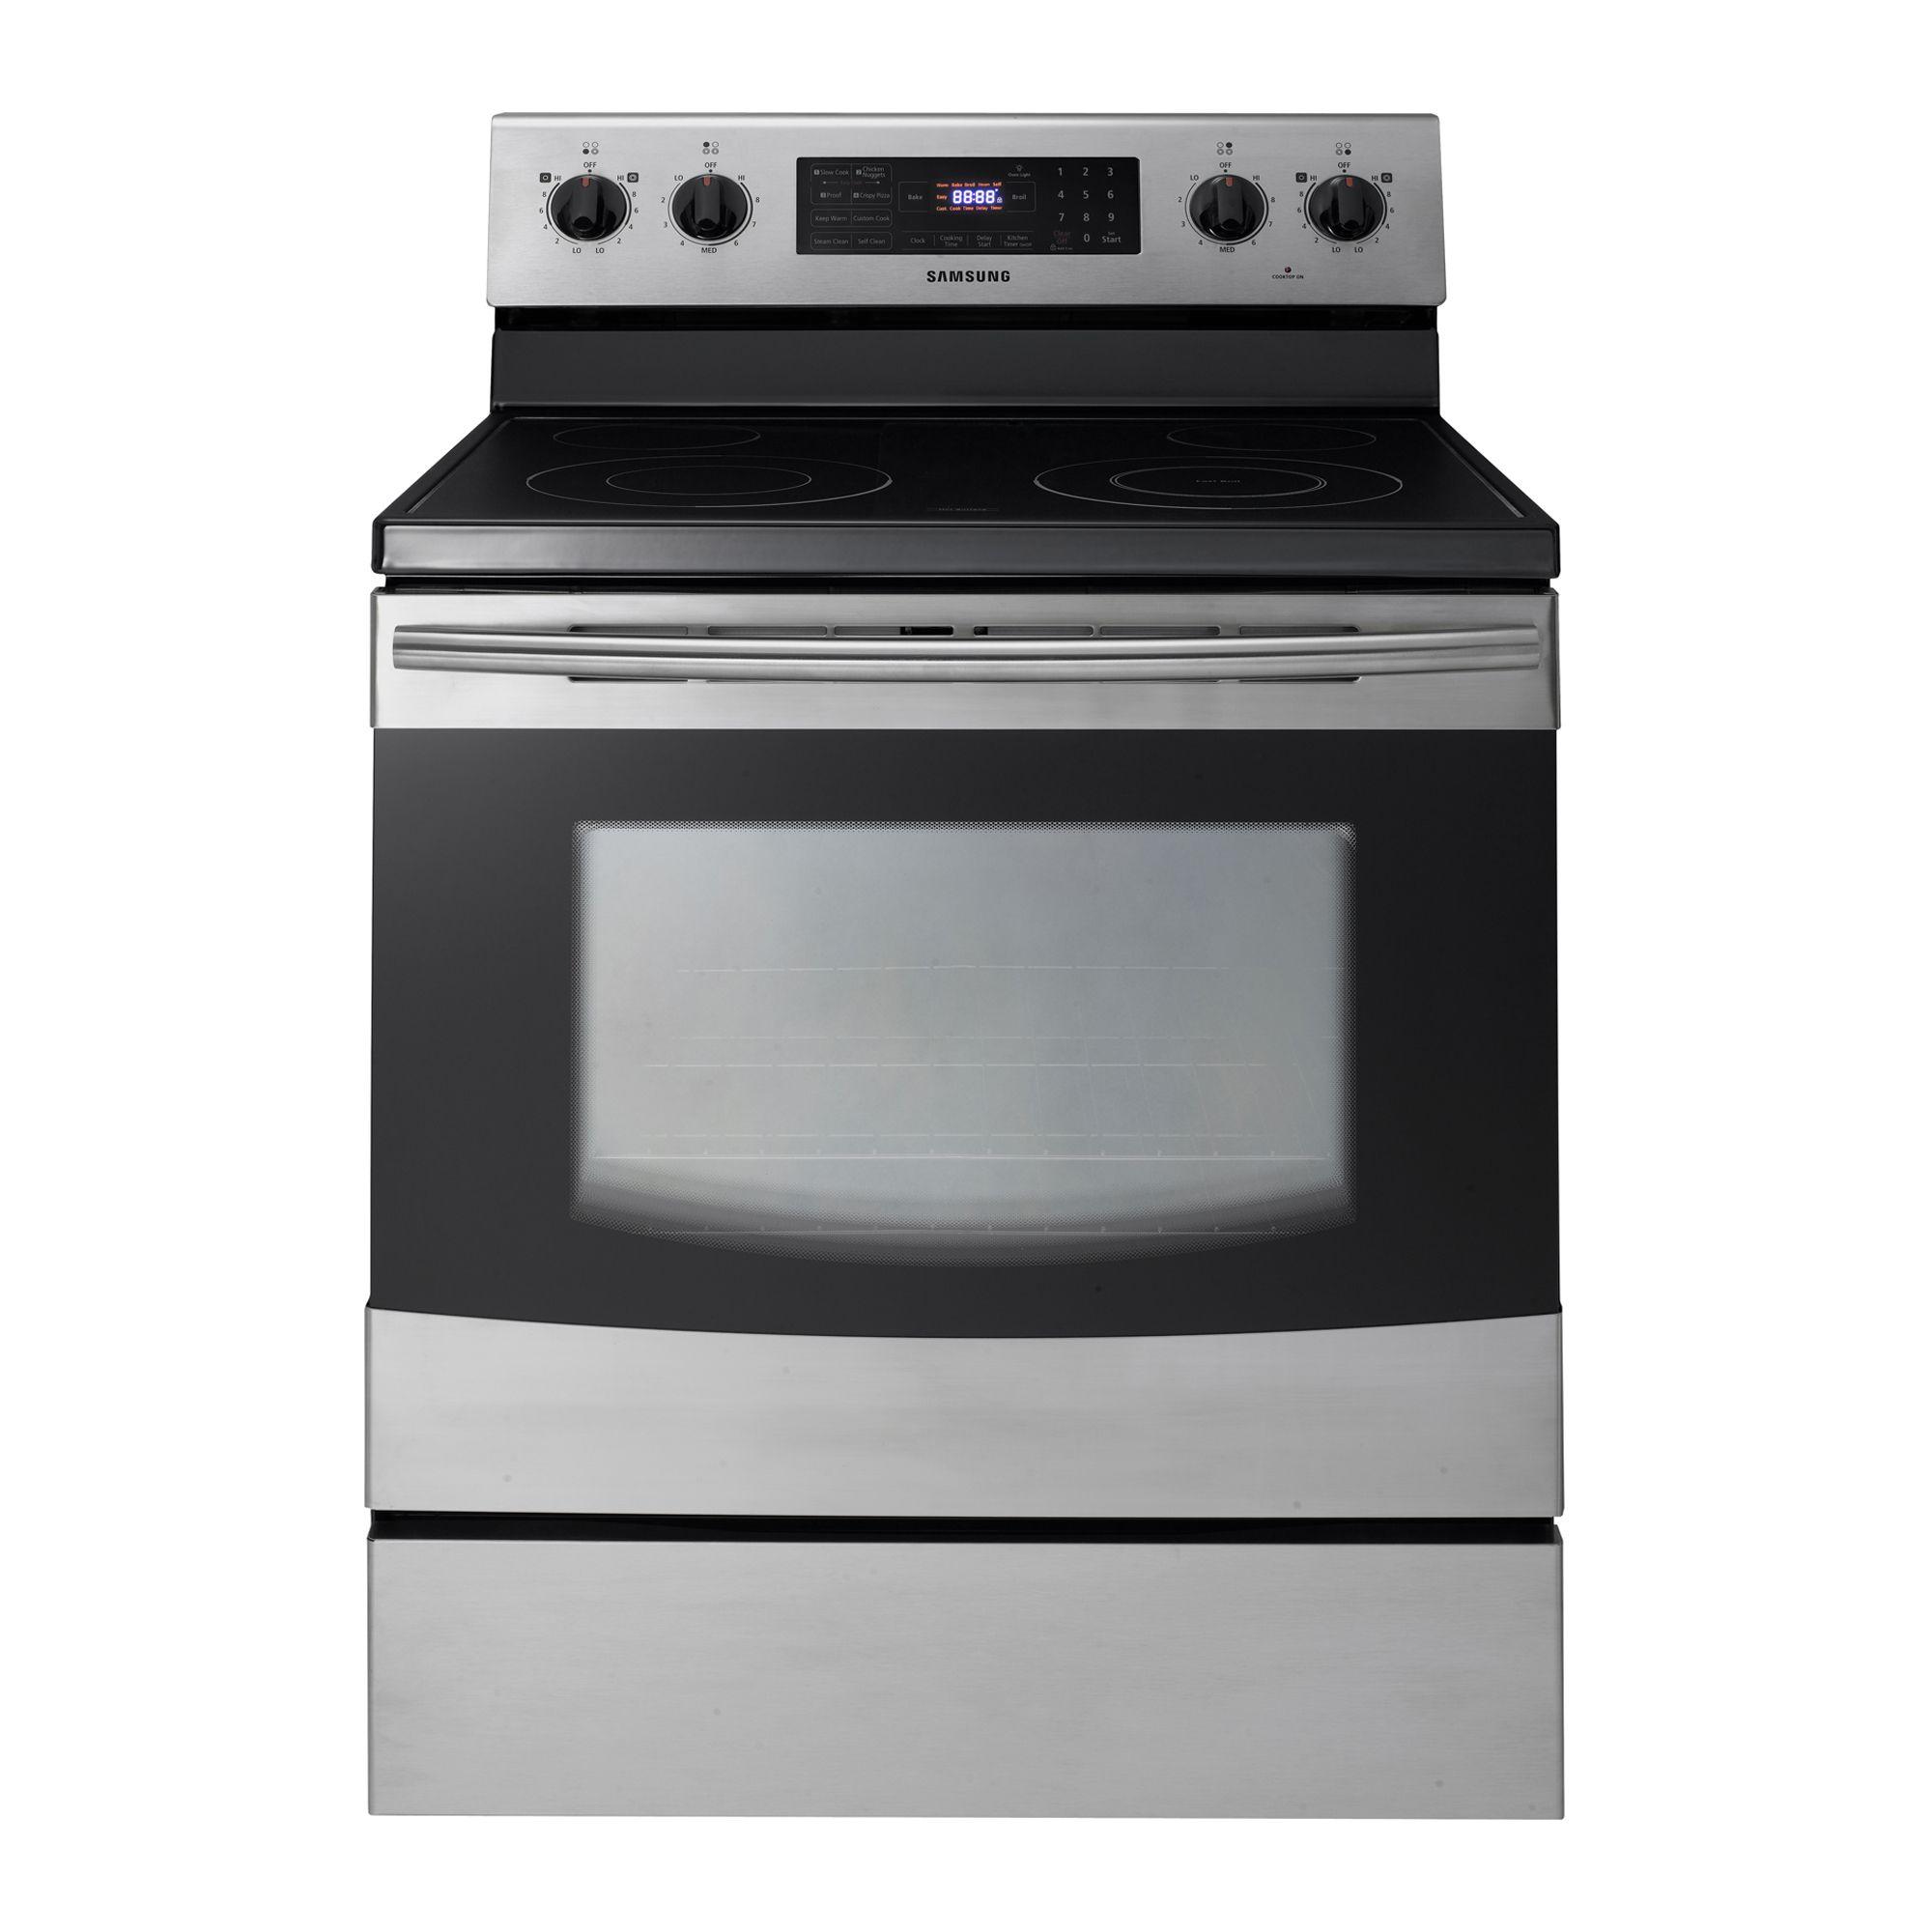 electric stove motor starter wiring diagrams kenmore self cleaning range spacious efficient